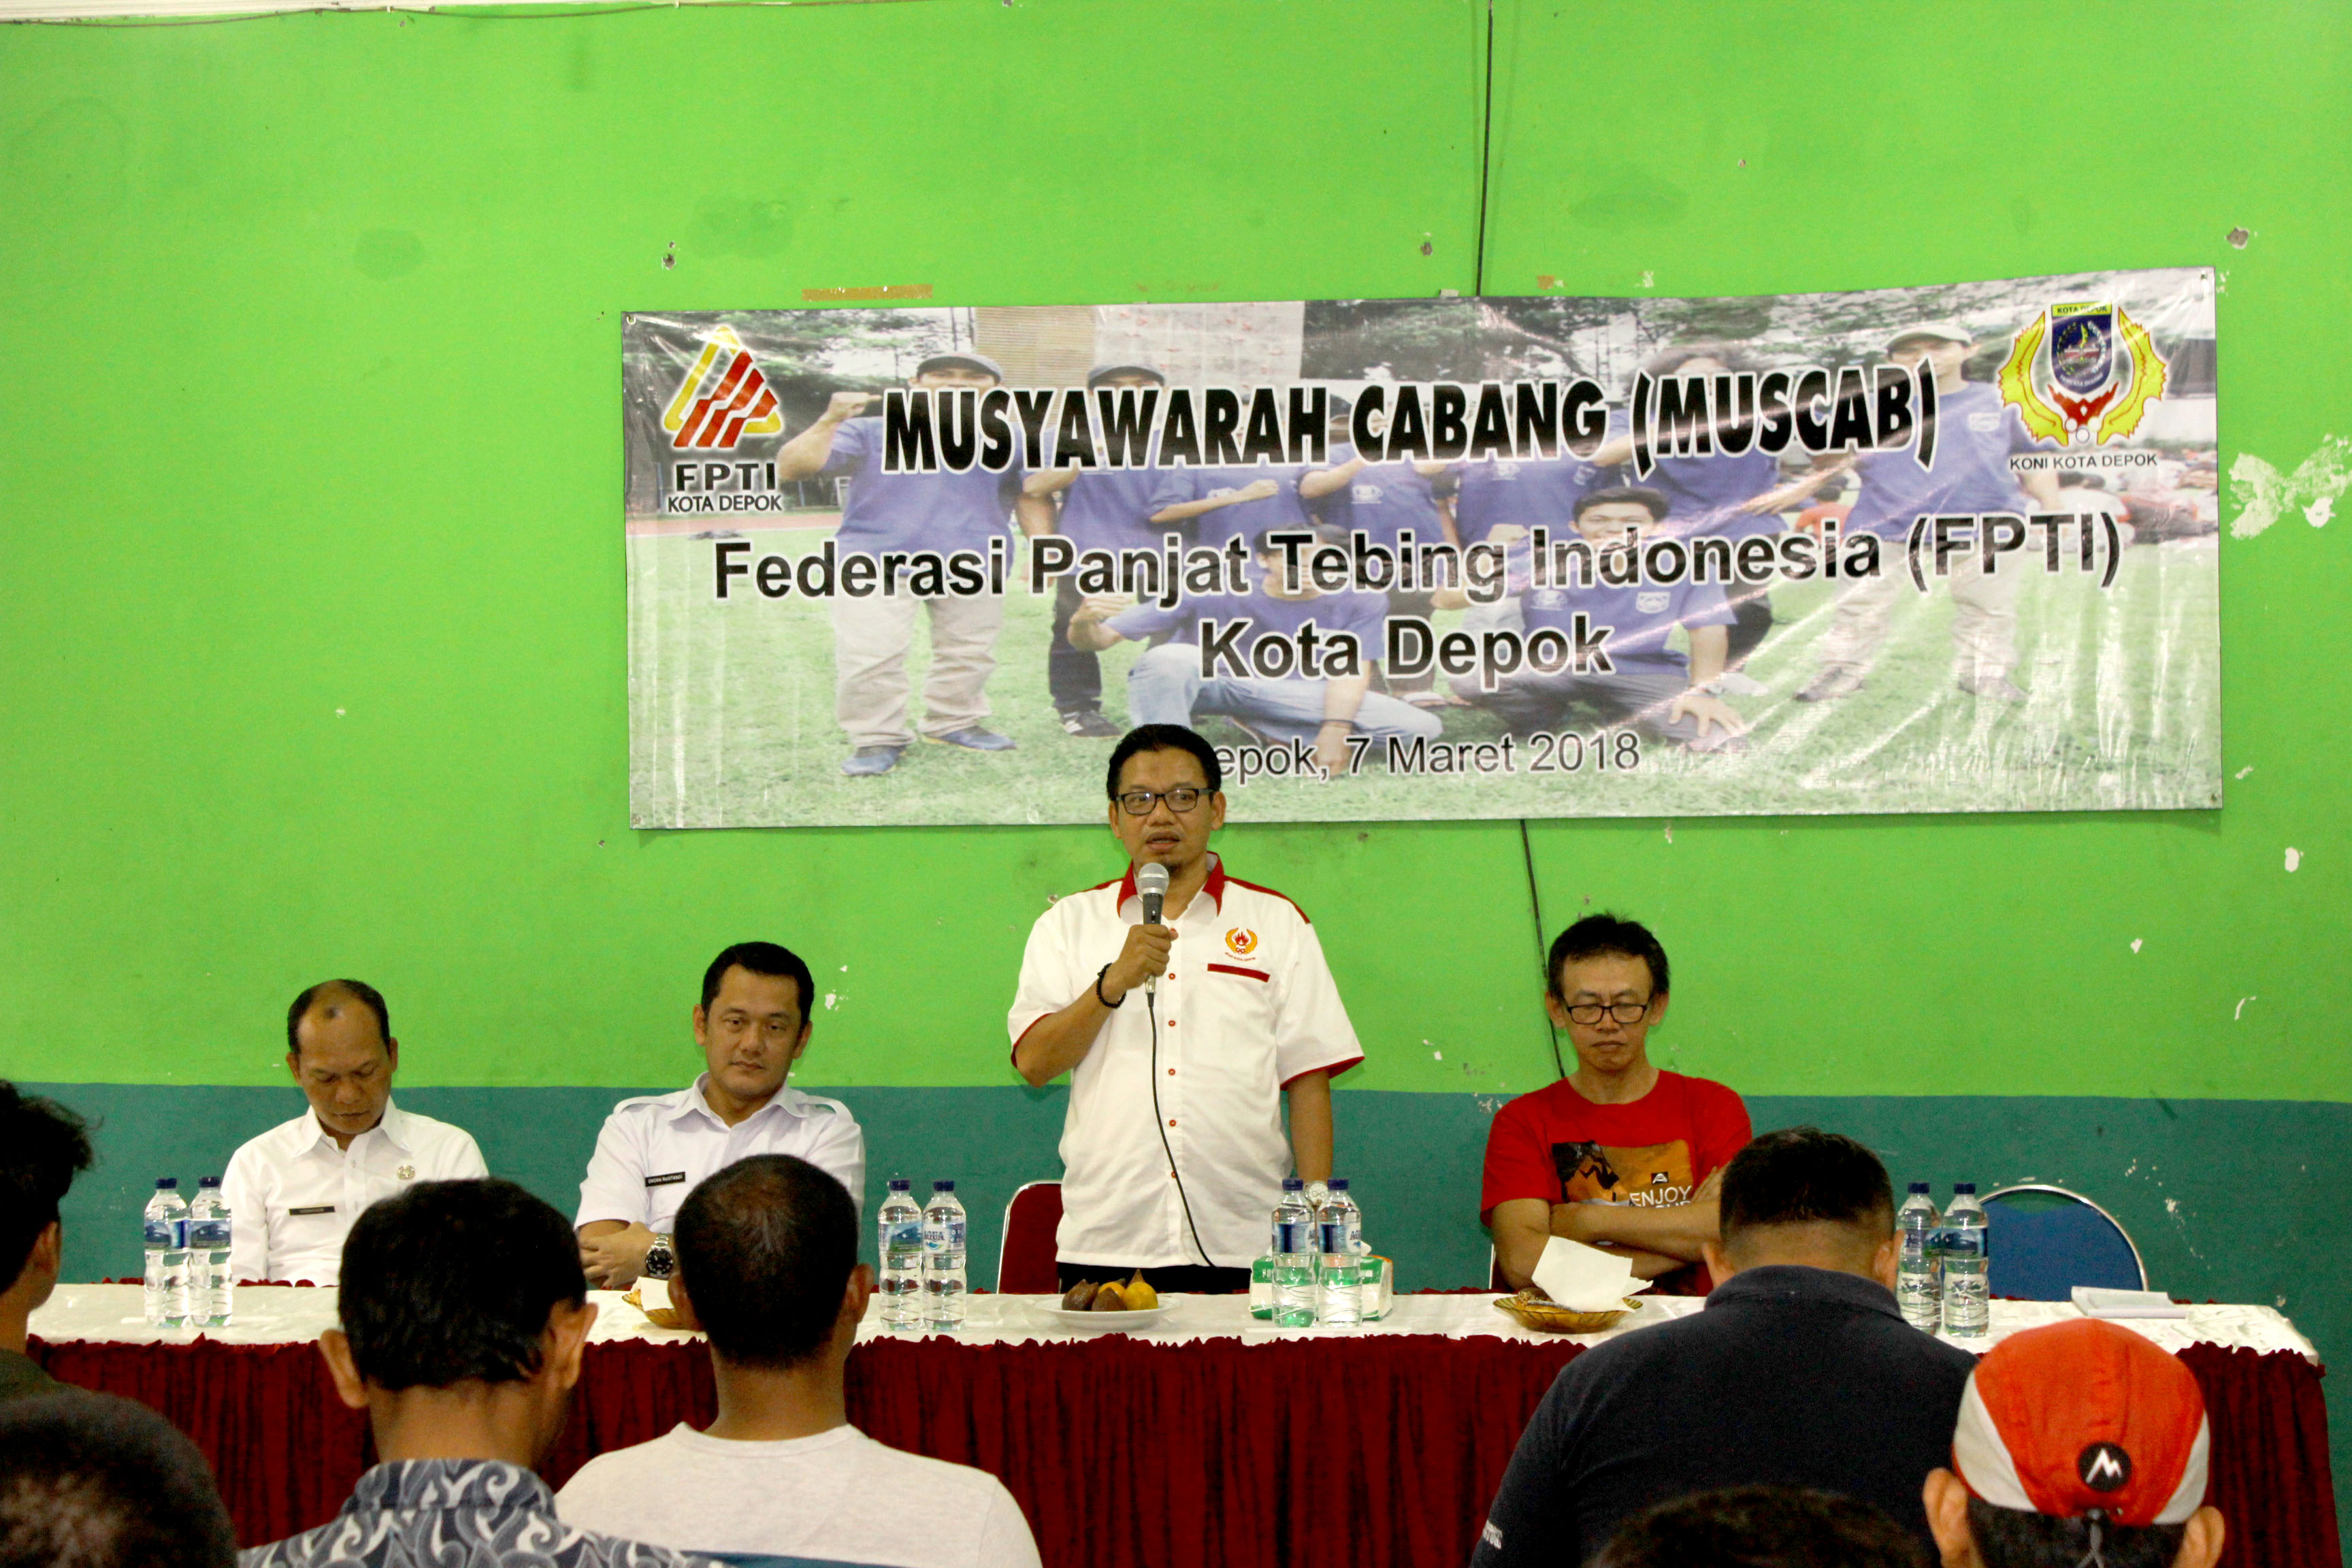 Ir TM Yusuf Syahputra Wakil Ketua 3 Bidang Organisasi saat memberikan sambutan di acara Musyawarah cabang olahraga FPTI Kota Depok.